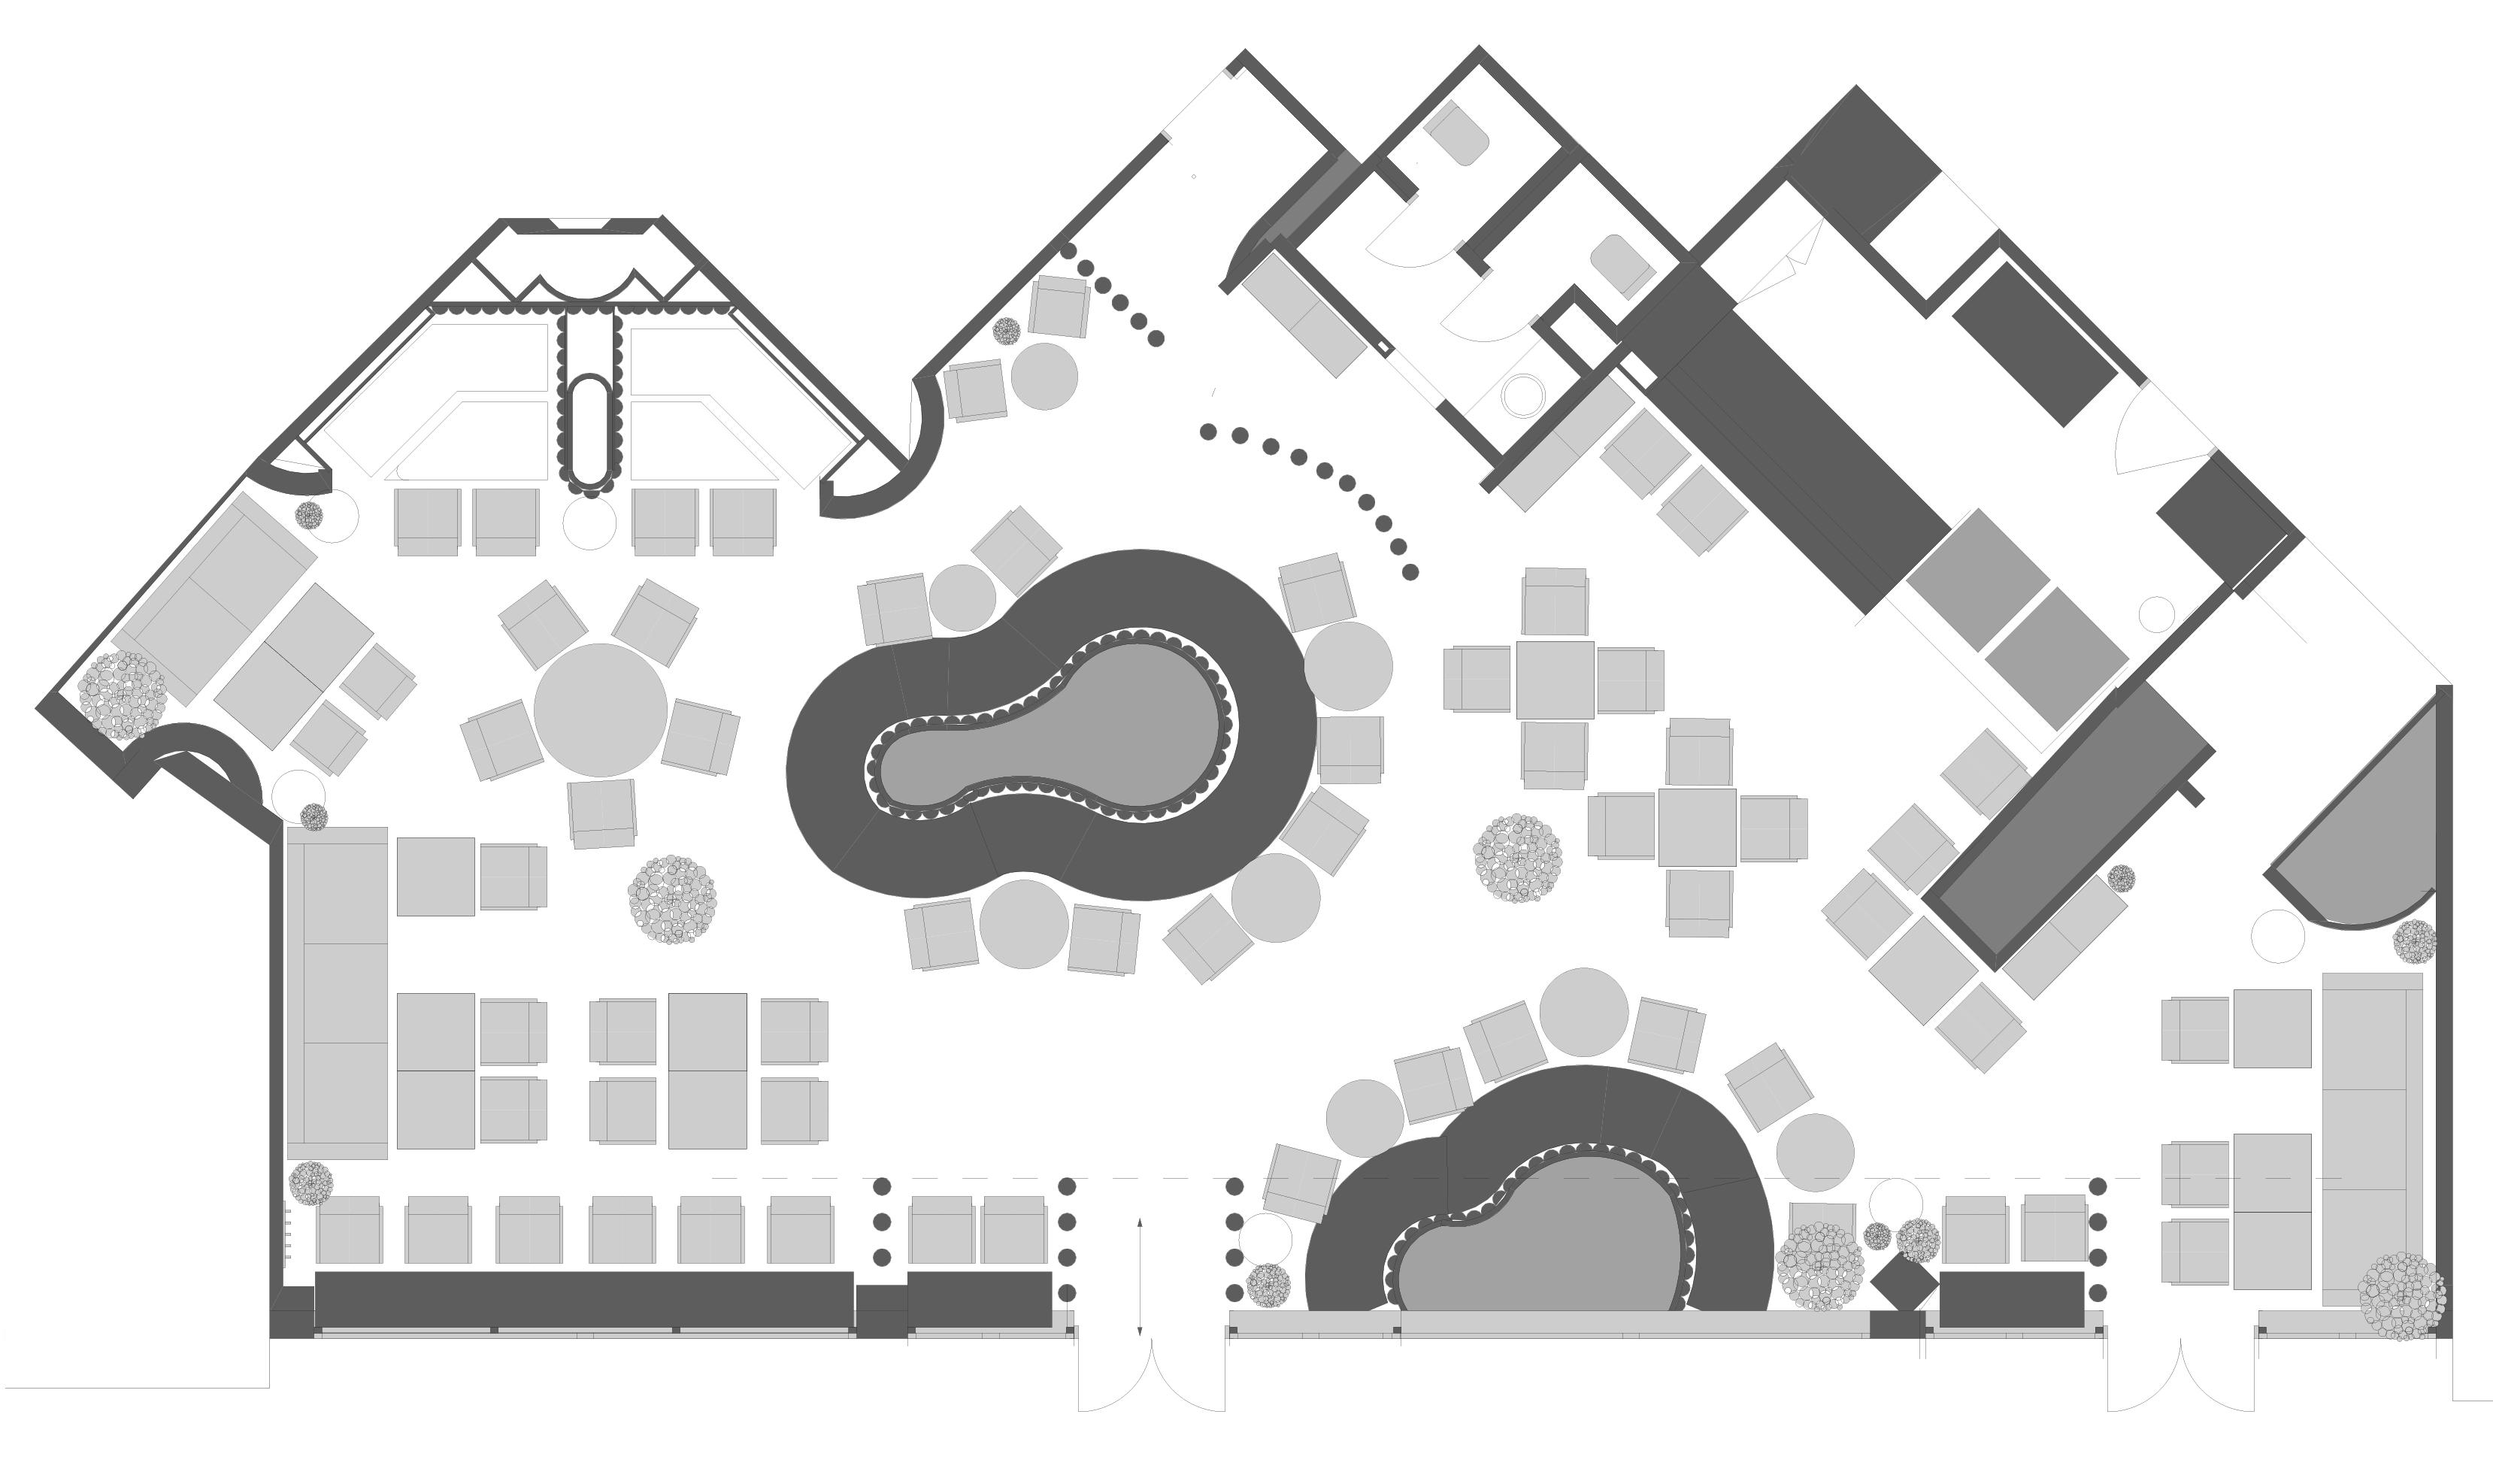 allartsdesign saranin redcupsochi design interior cafe plane.jpg